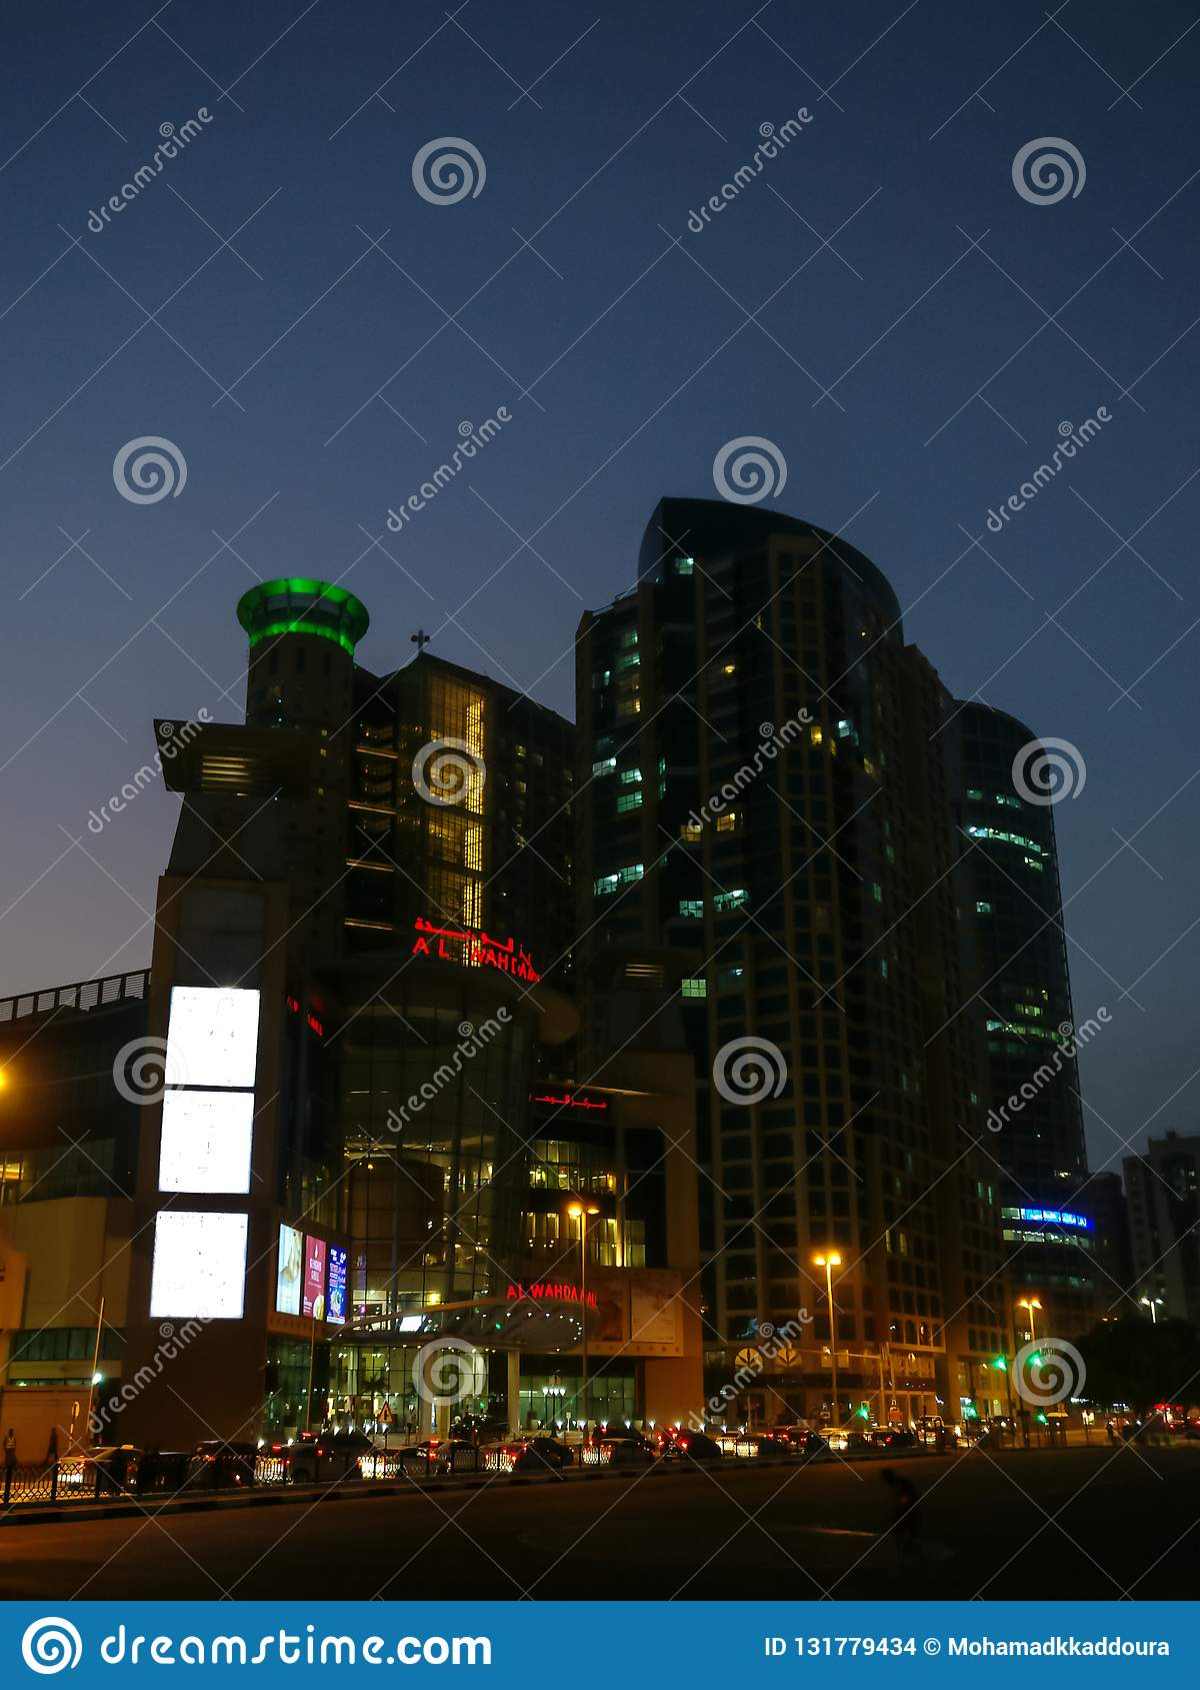 Shot Of Abu Dhabi City Al Wahda Mall, Towers At Night - Mock